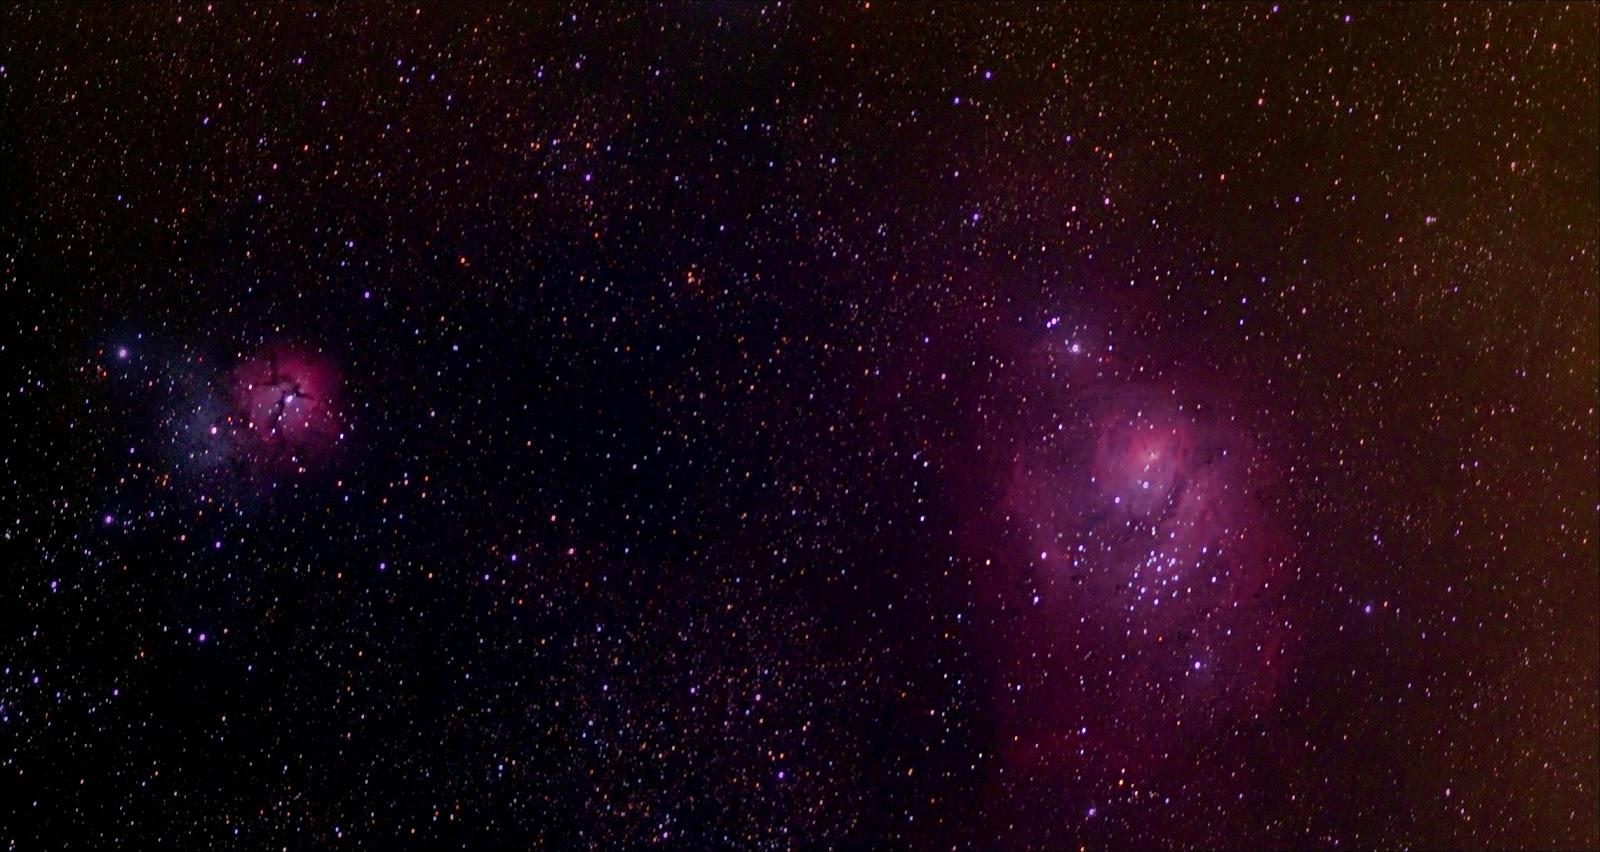 lagoon trifid nebula - photo #24